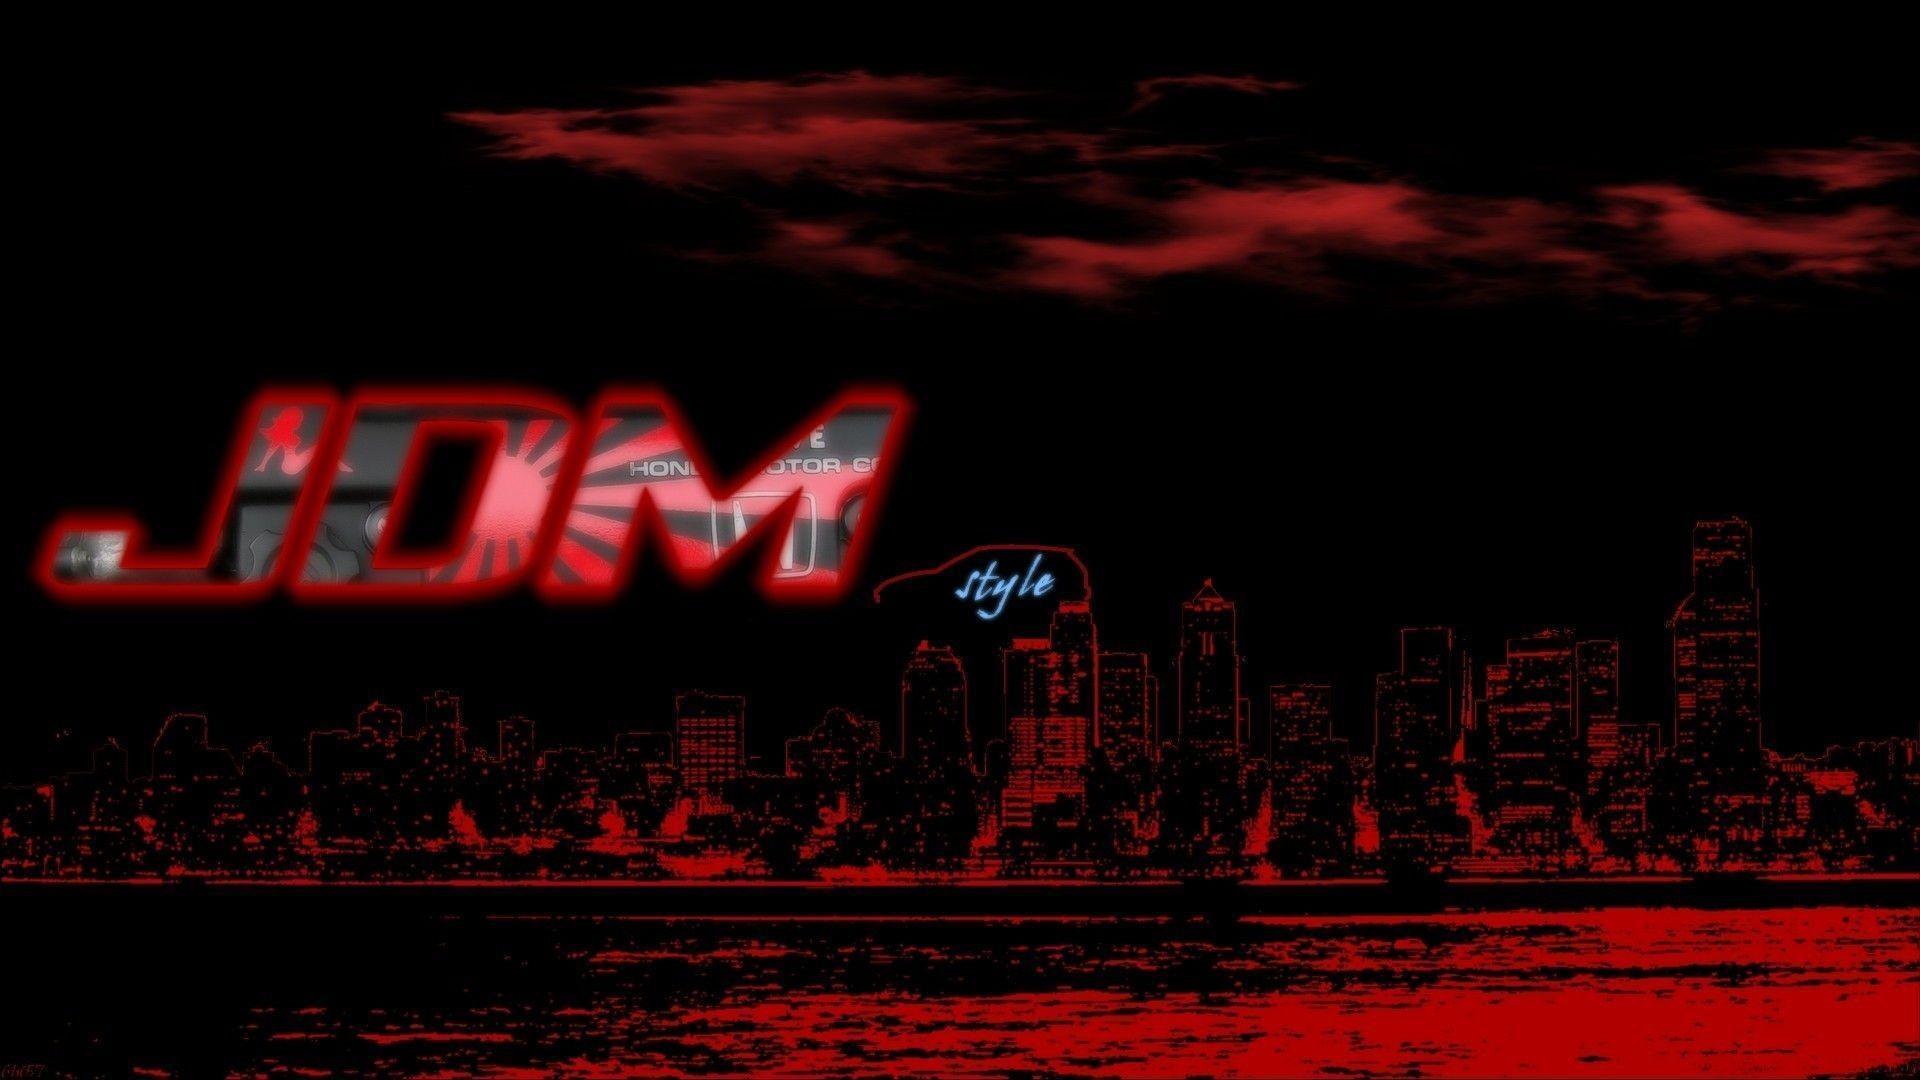 Jdm Honda Logo Wallpaper – image #125